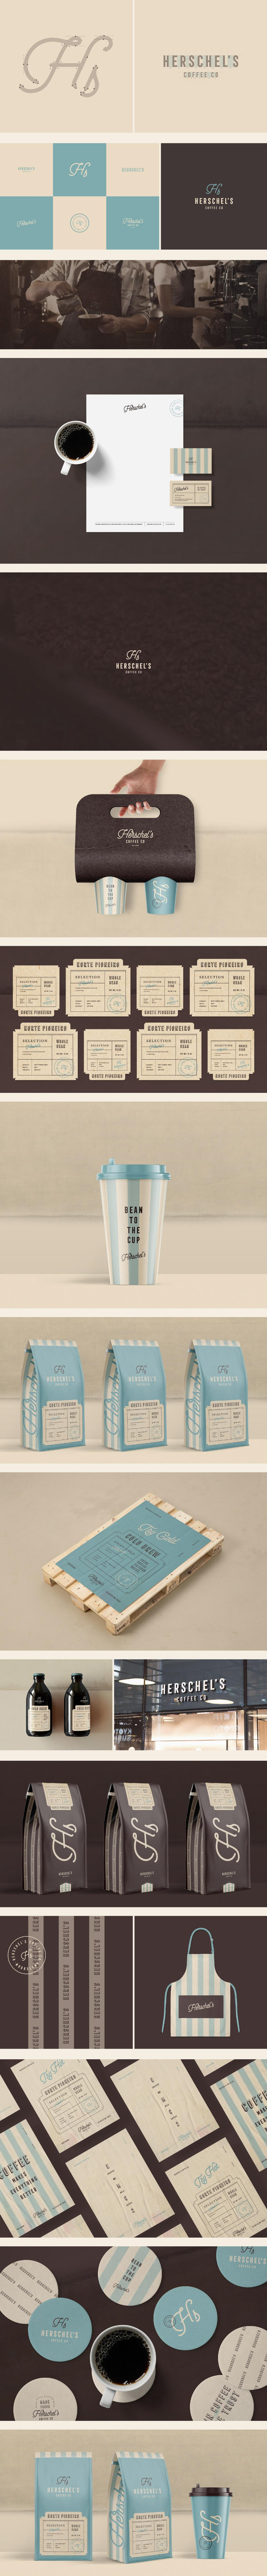 Branding, Graphic Design